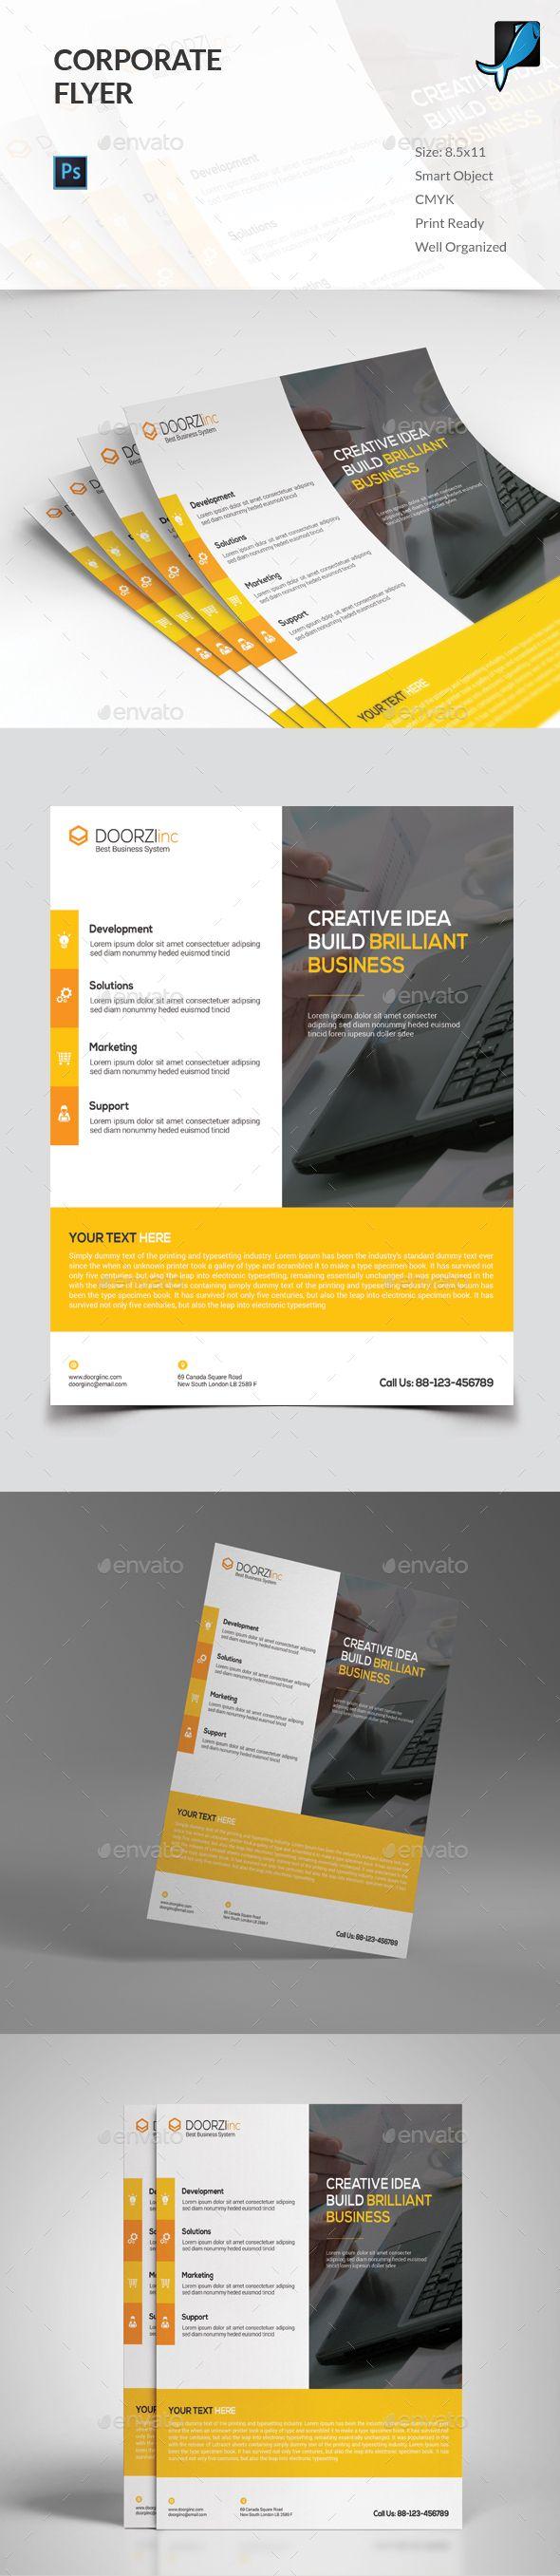 Corporate Flyer Template PSD #design Download: http://graphicriver.net/item/corporate-flyer/13485139?ref=ksioks